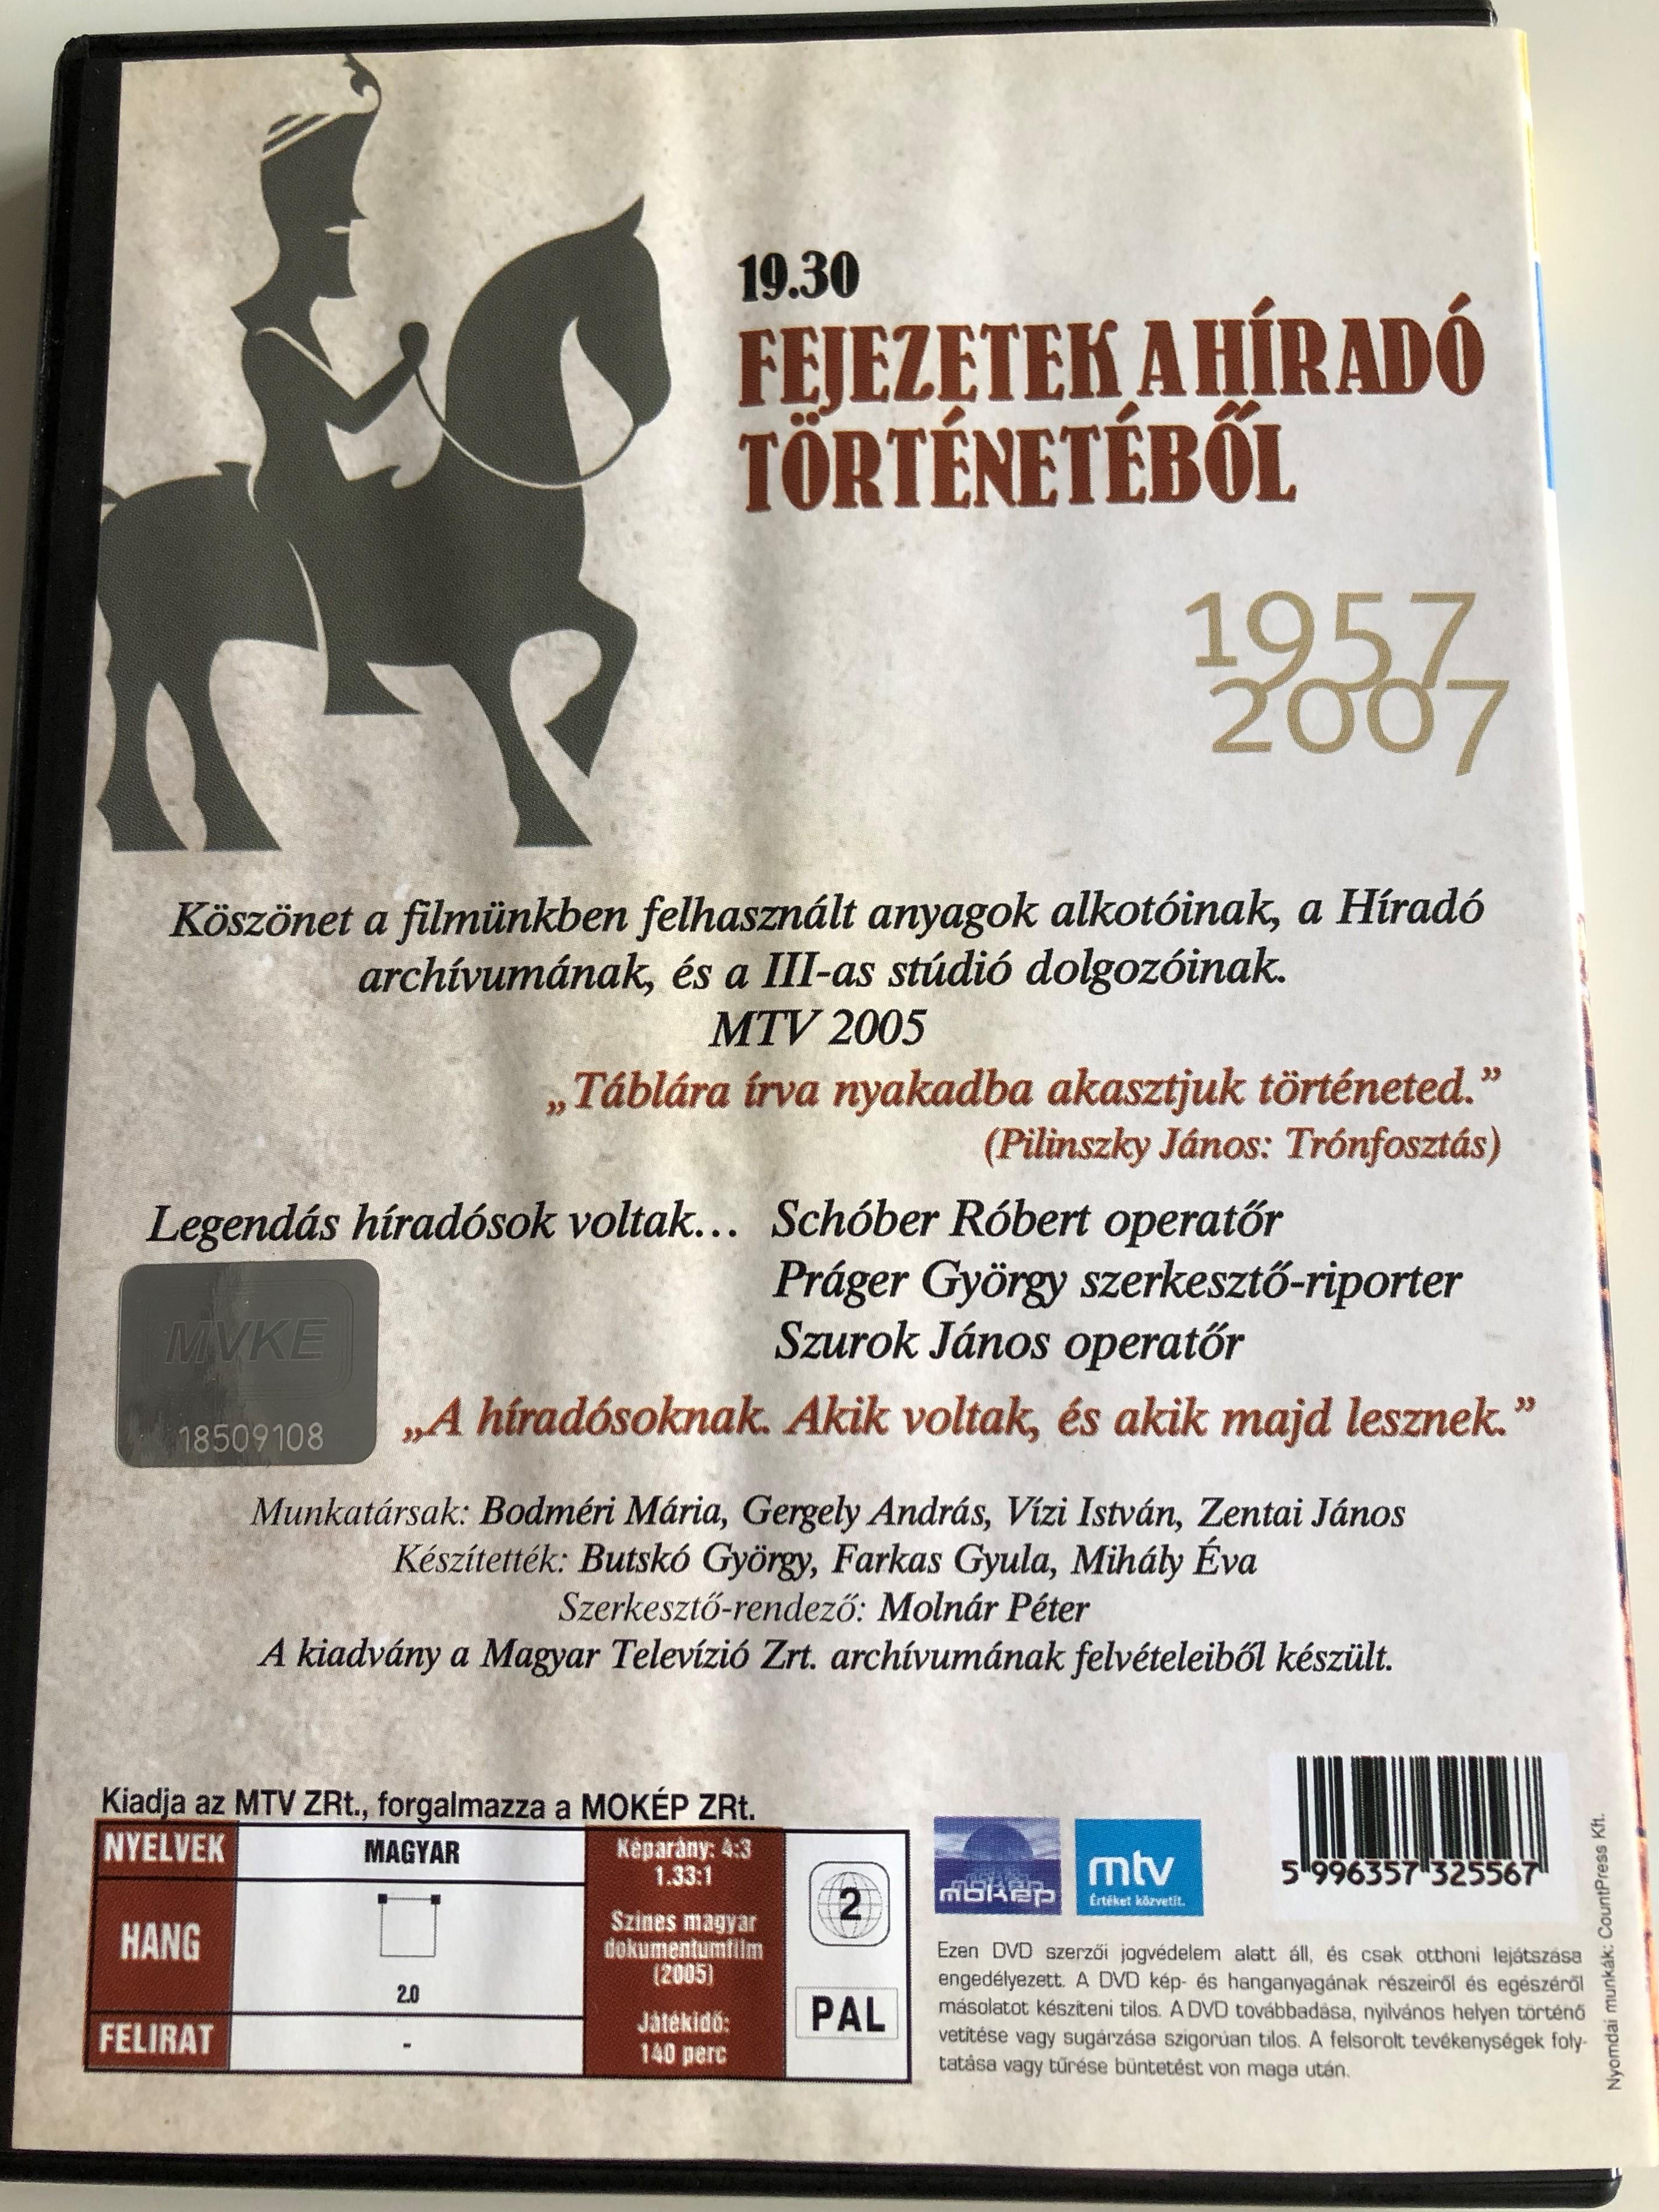 magyar-telev-zi-19.30-fejezetek-a-h-rad-t-rt-net-b-l-dvd-3.jpg